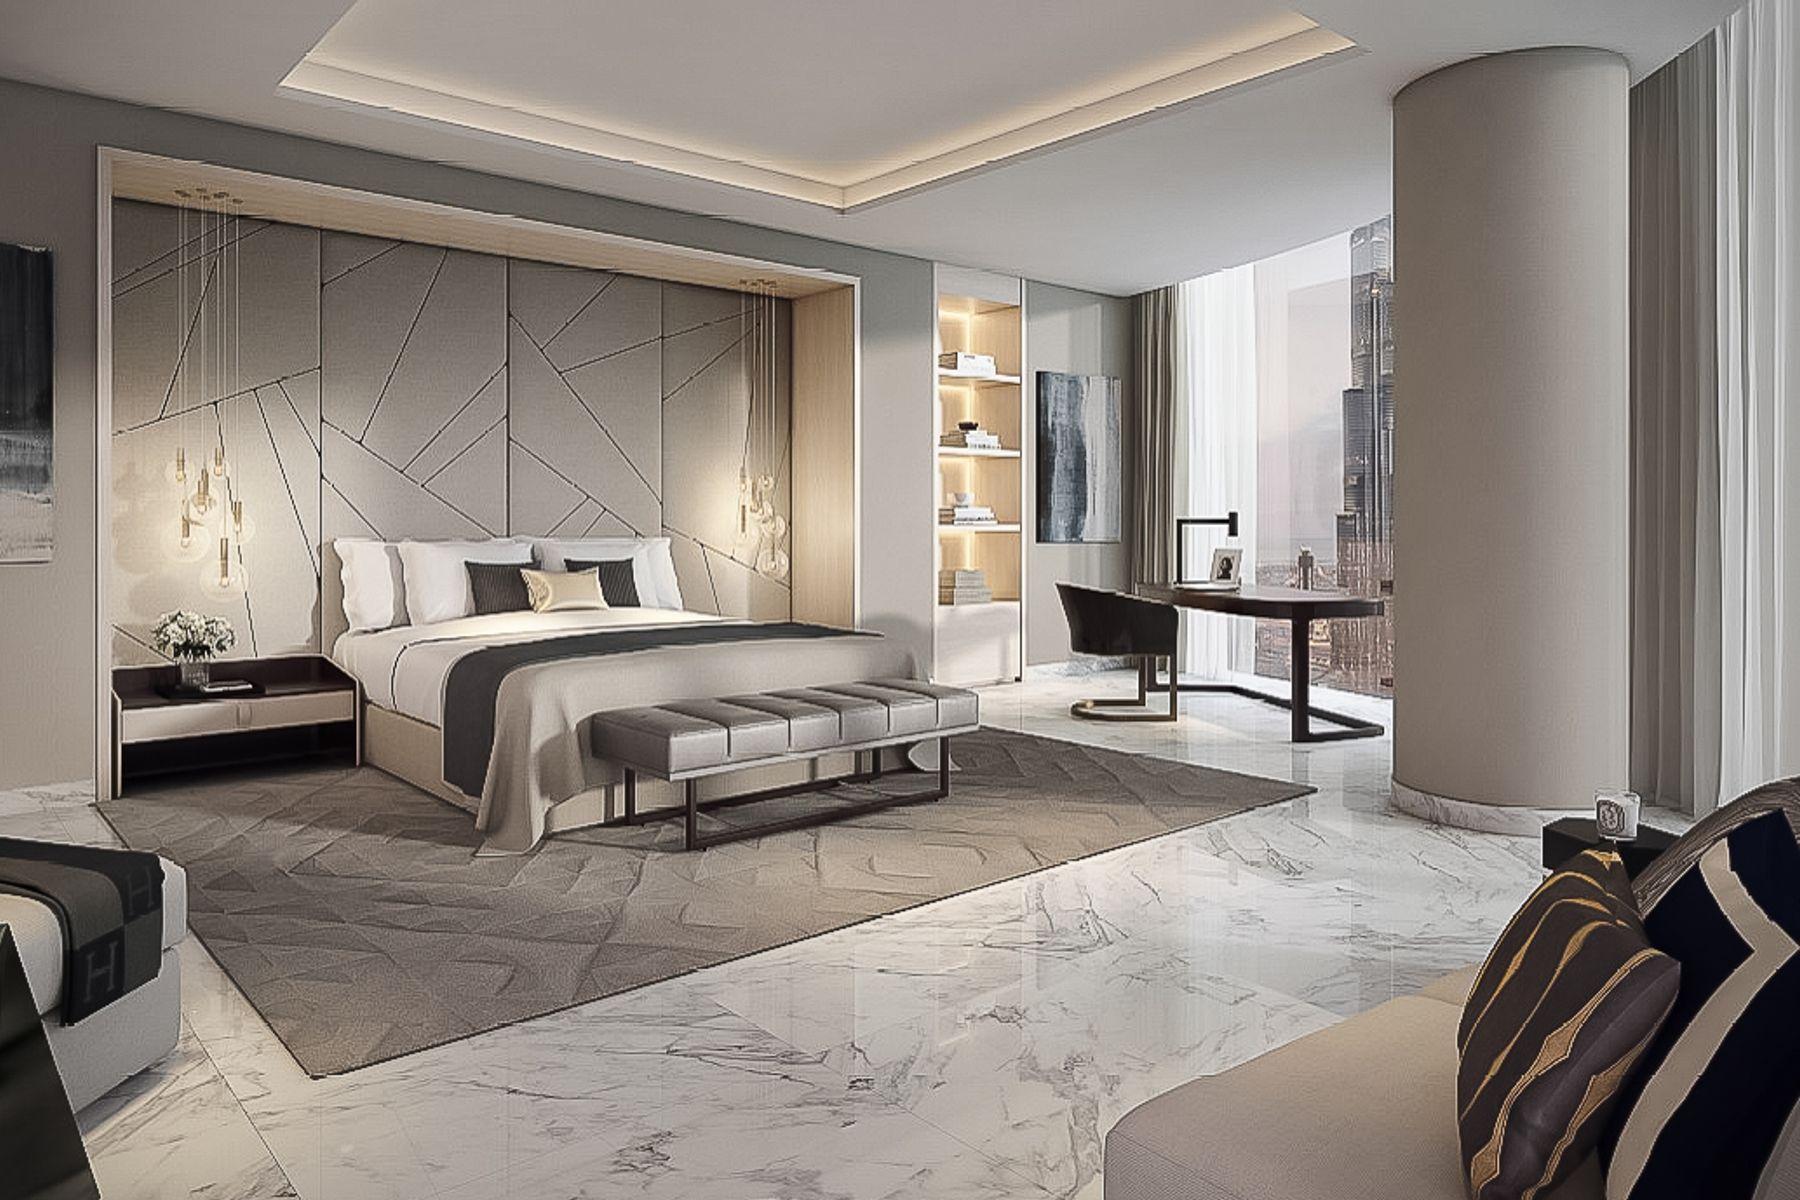 lavish bedroom with carerra marble floors in dubai